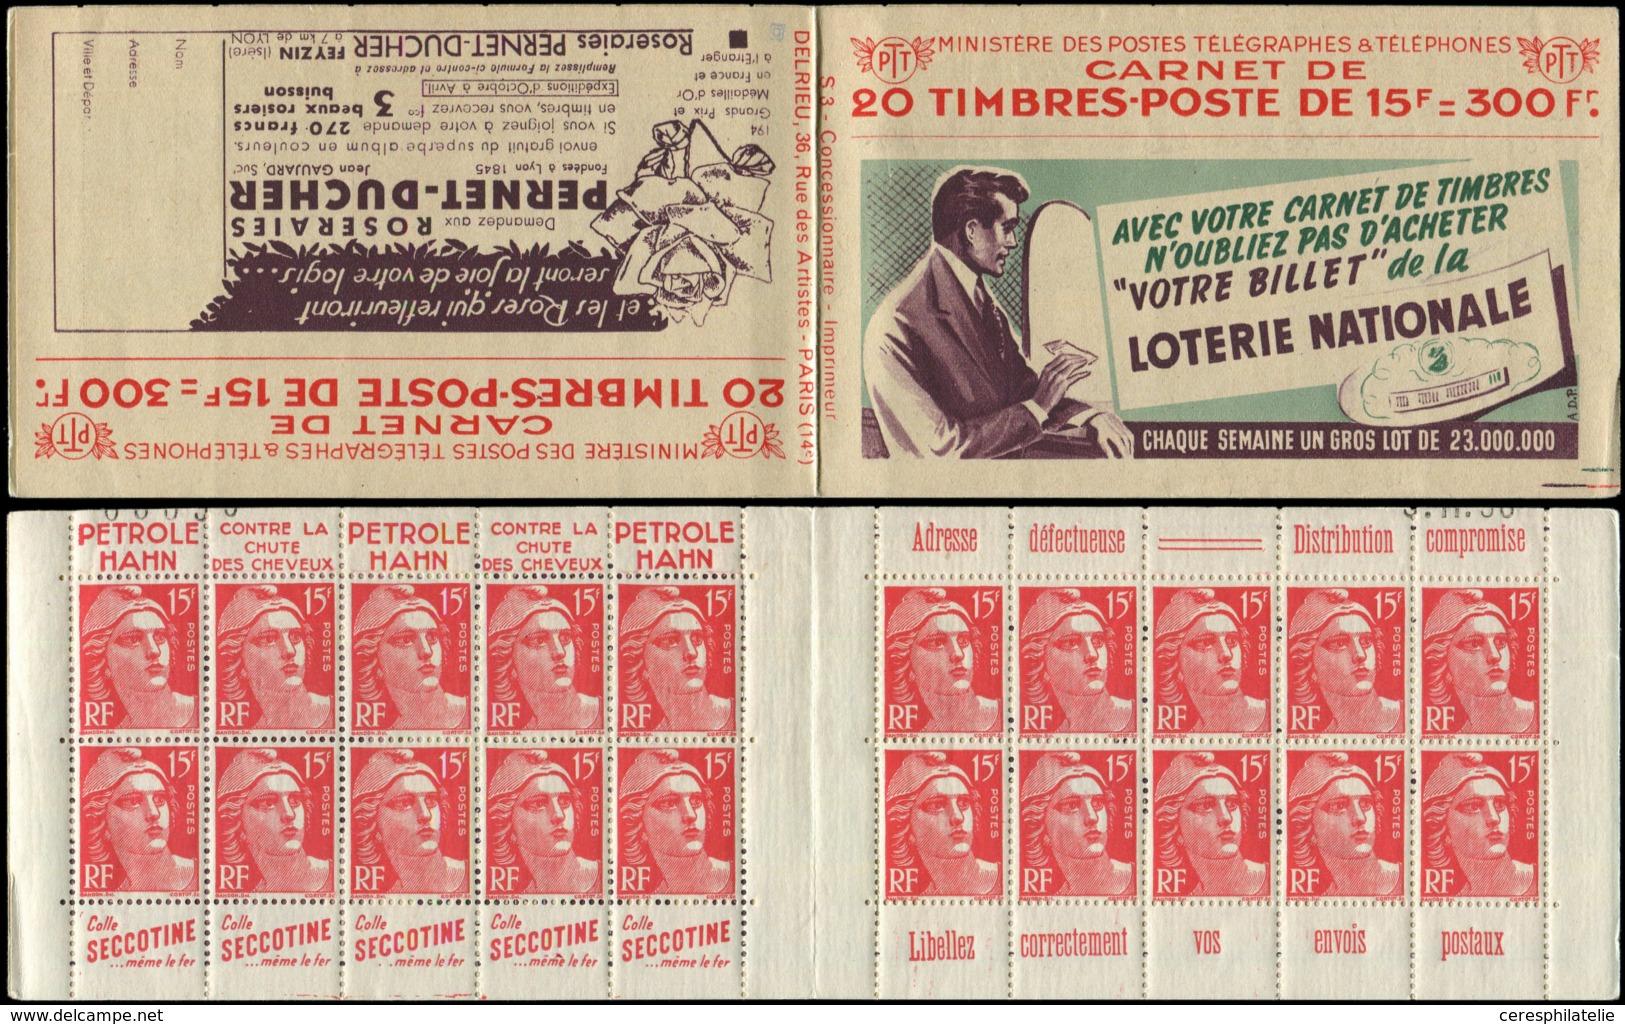 CARNETS (N° Yvert) -  813-C2    Gandon, 15f. Rouge, N°813b, T II, S. 3, LOTERIE NATIONALE/PERNET DUCHER, N° Et Date Tron - Carnets